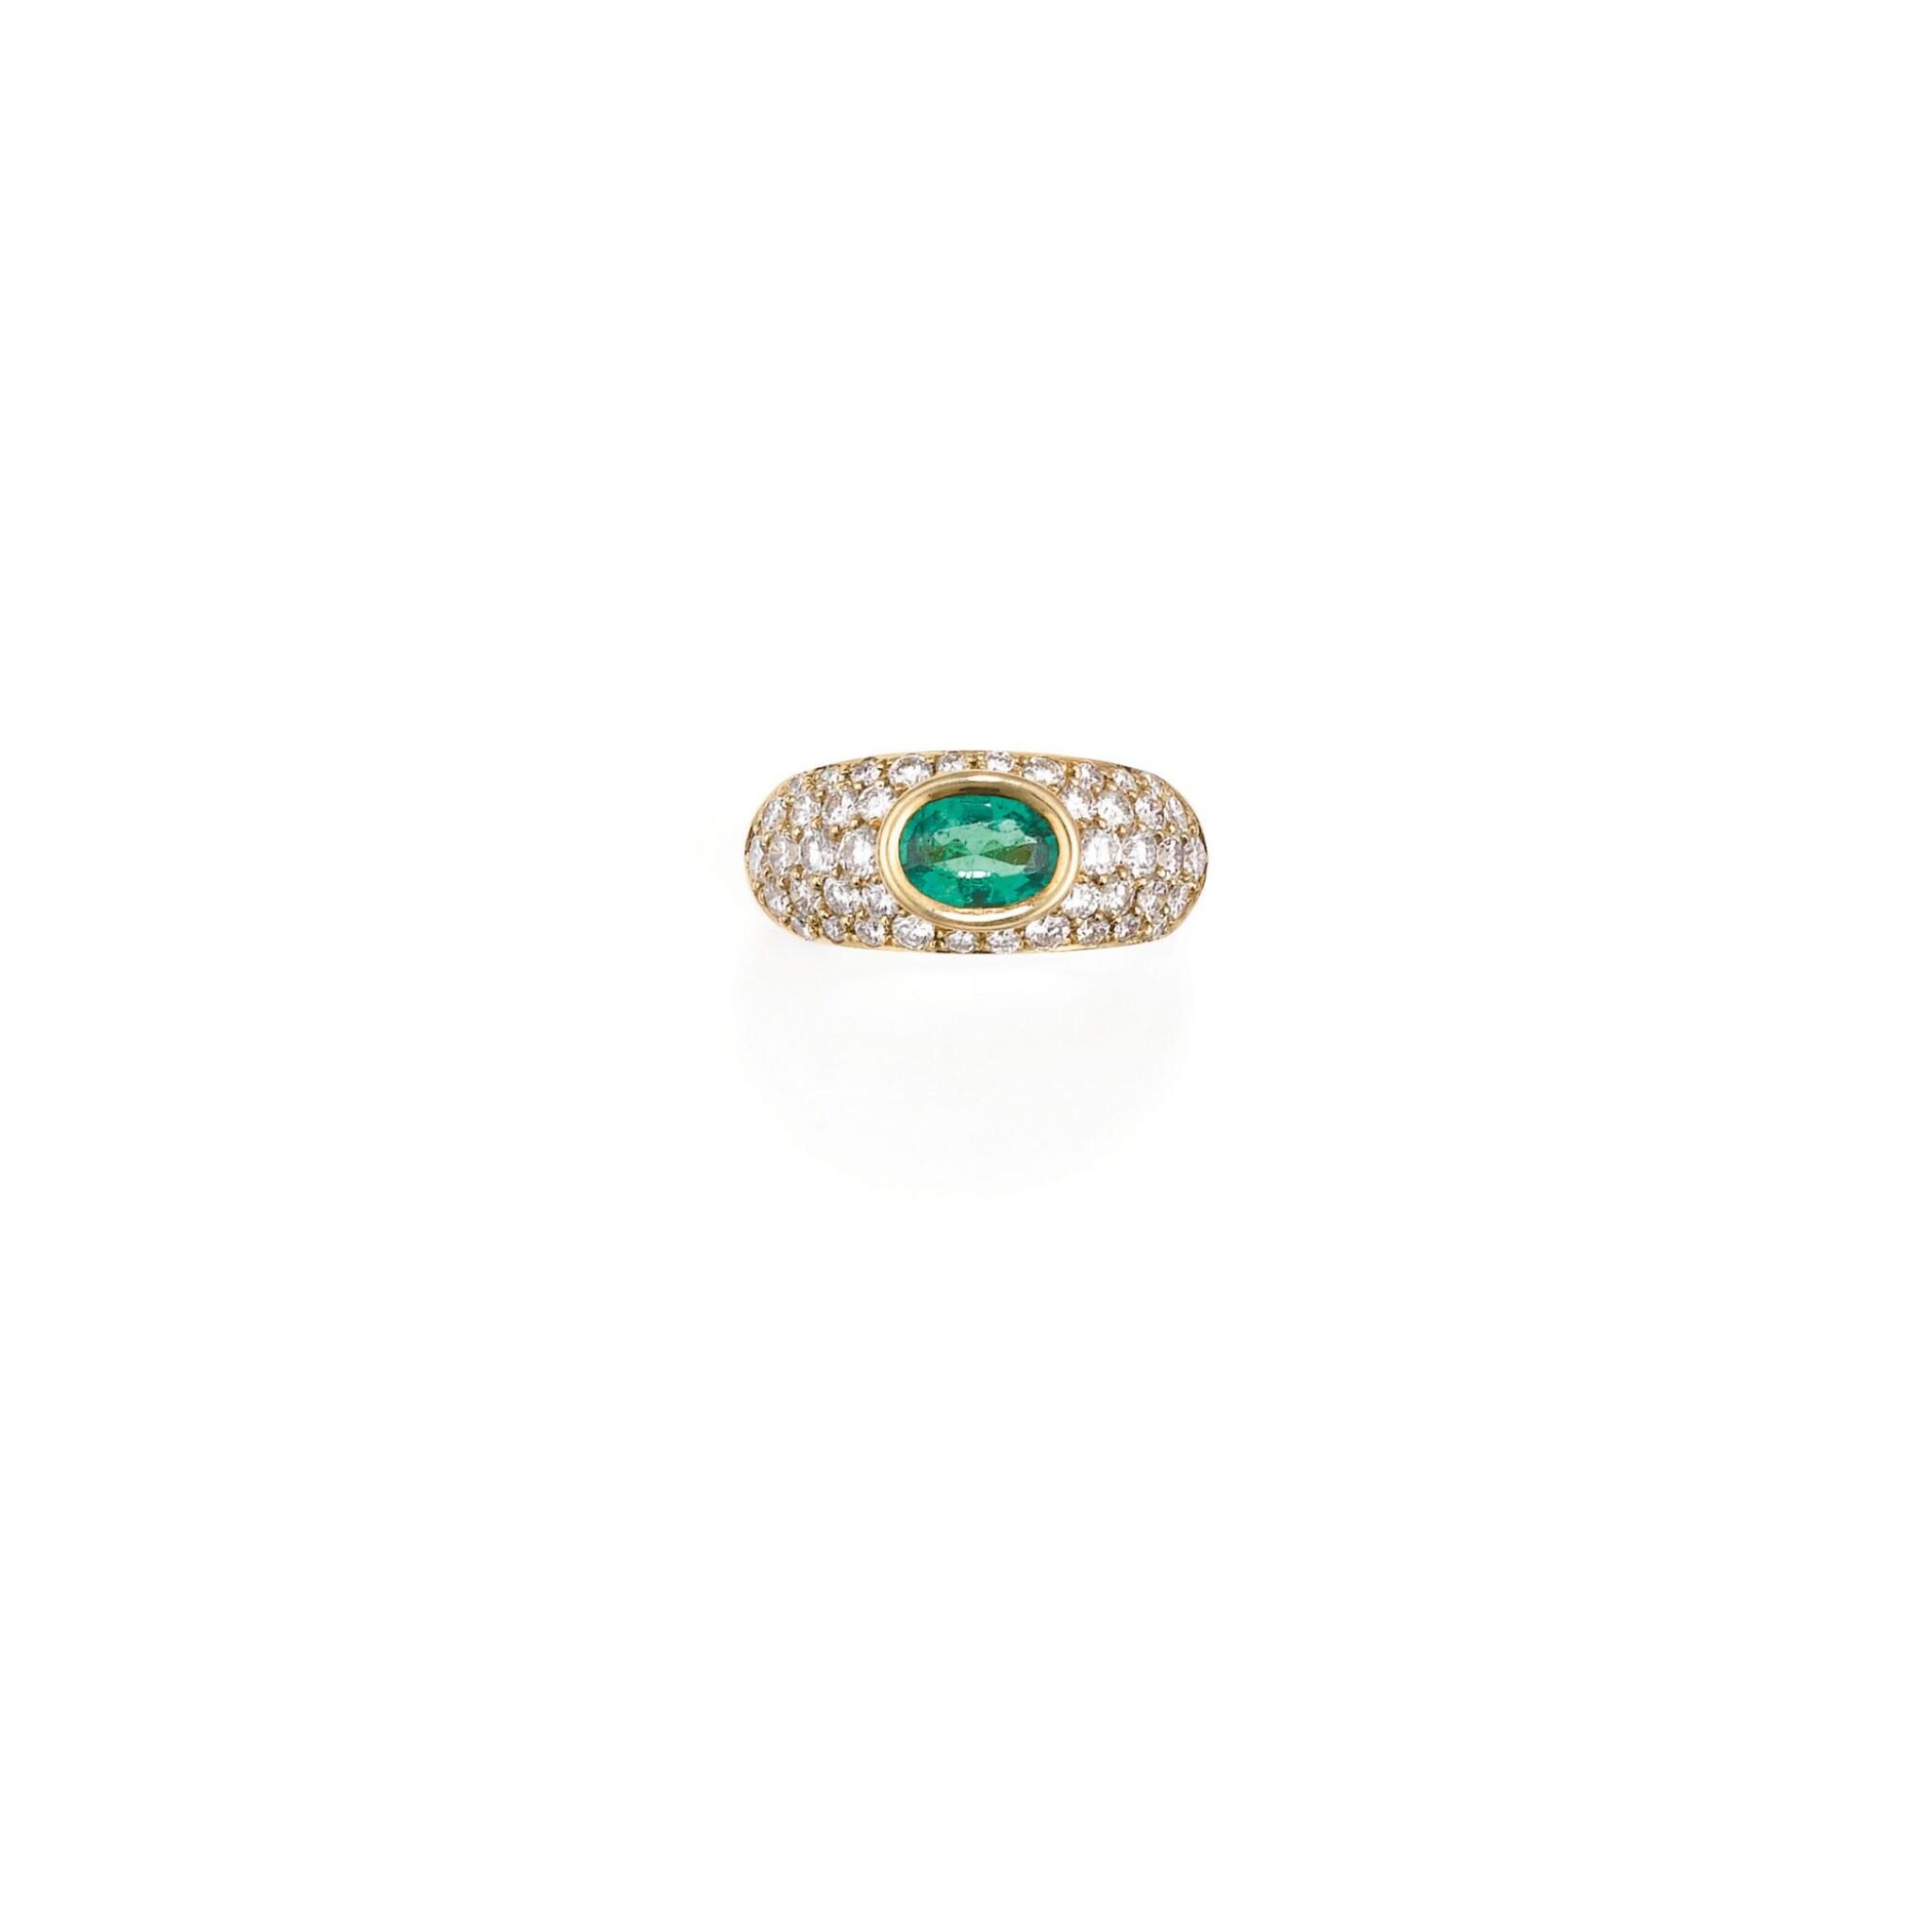 BAGUE EMERAUDE ET DIAMANTS, MELLERIO | EMERALD AND DIAMOND RING, MELLERIO